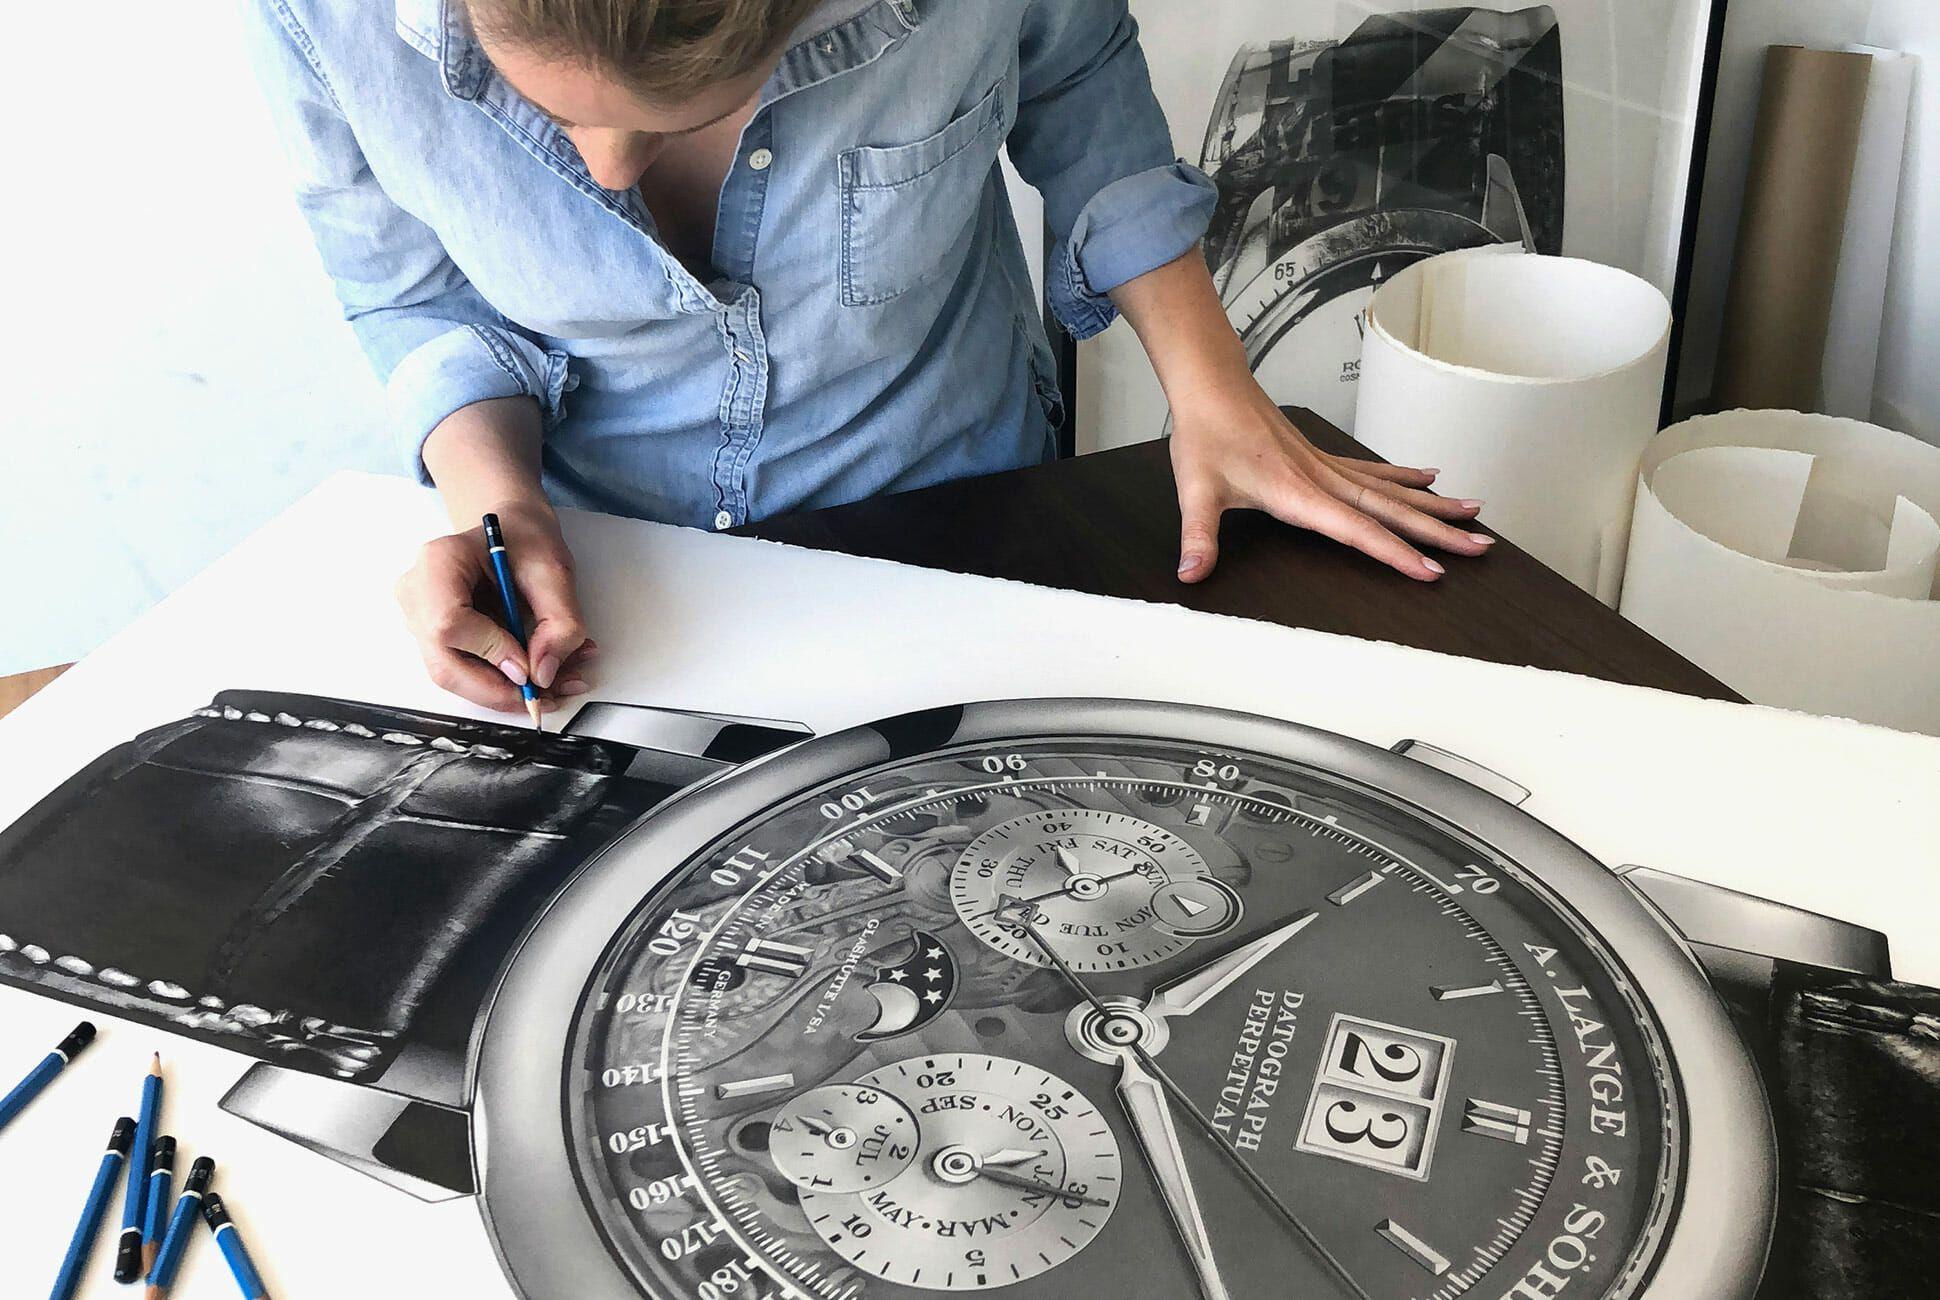 Julie-Kraulis-Watch-Art-gear-patrol-slide-3